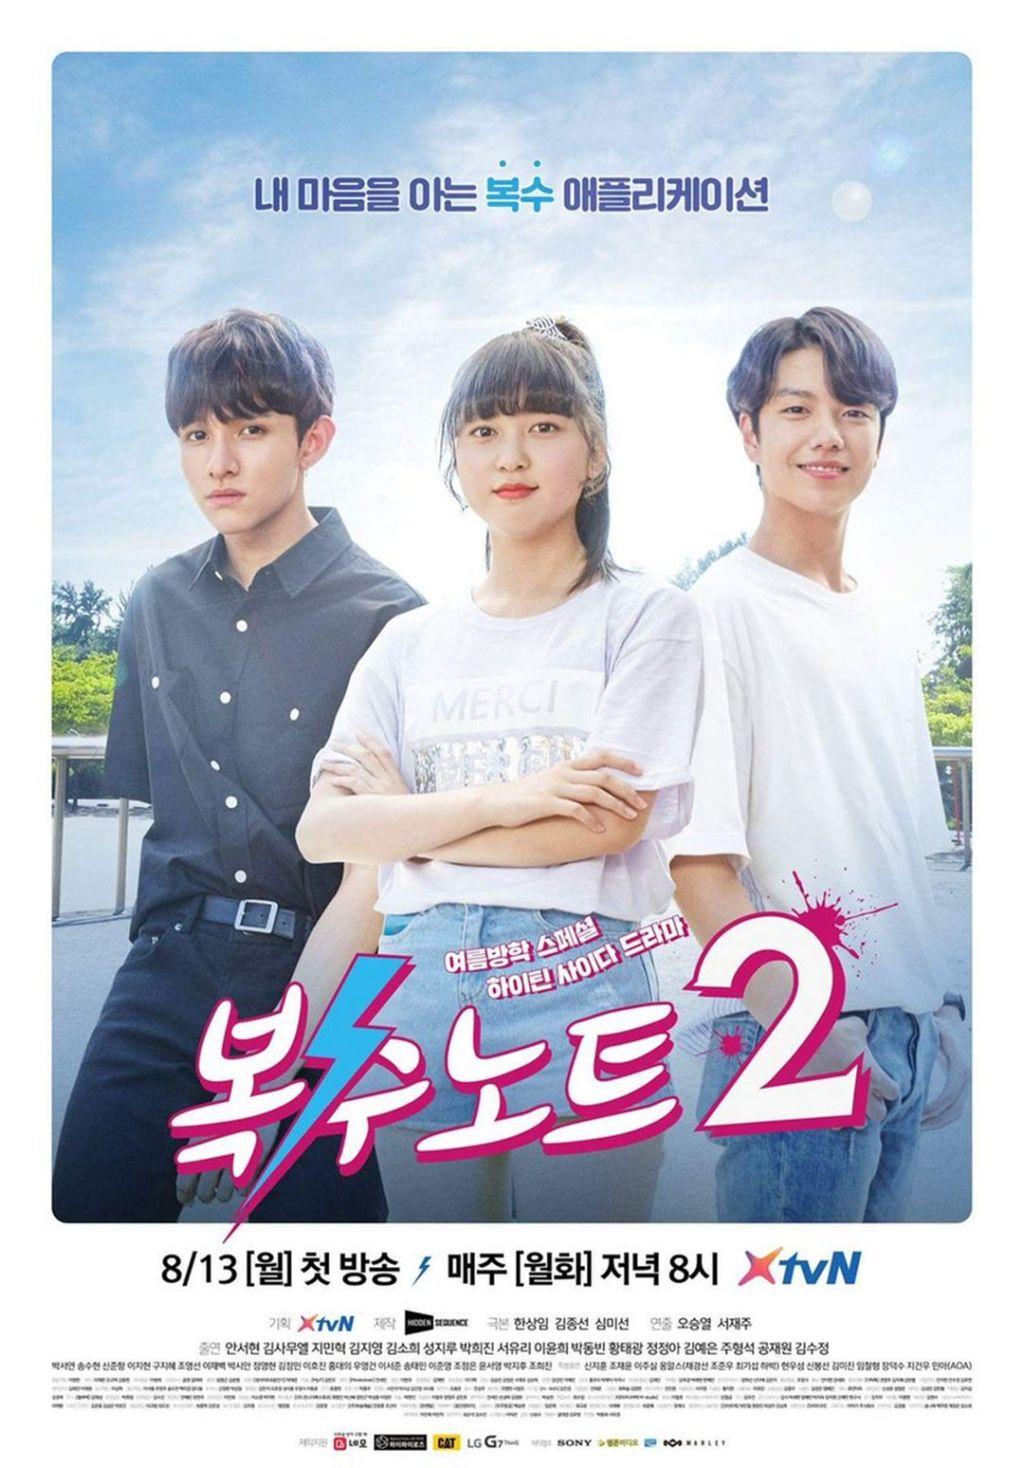 Sinopsis Dan Profil Lengkap Pemeran Mini Drama Revenge Note Season 2 (2018)